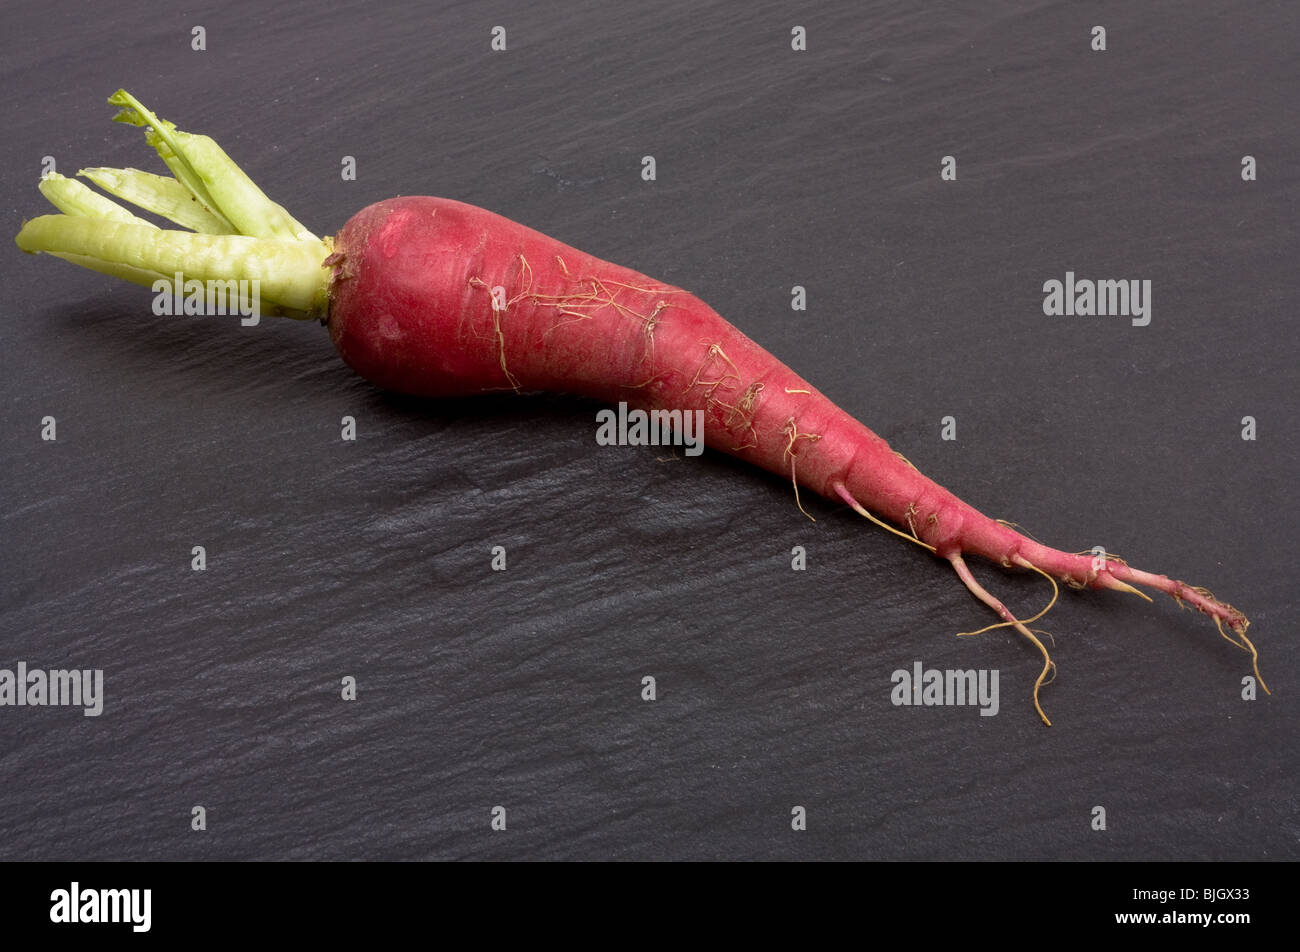 Vibrant Red mooli also known as Japanese radish on dark slate background. - Stock Image